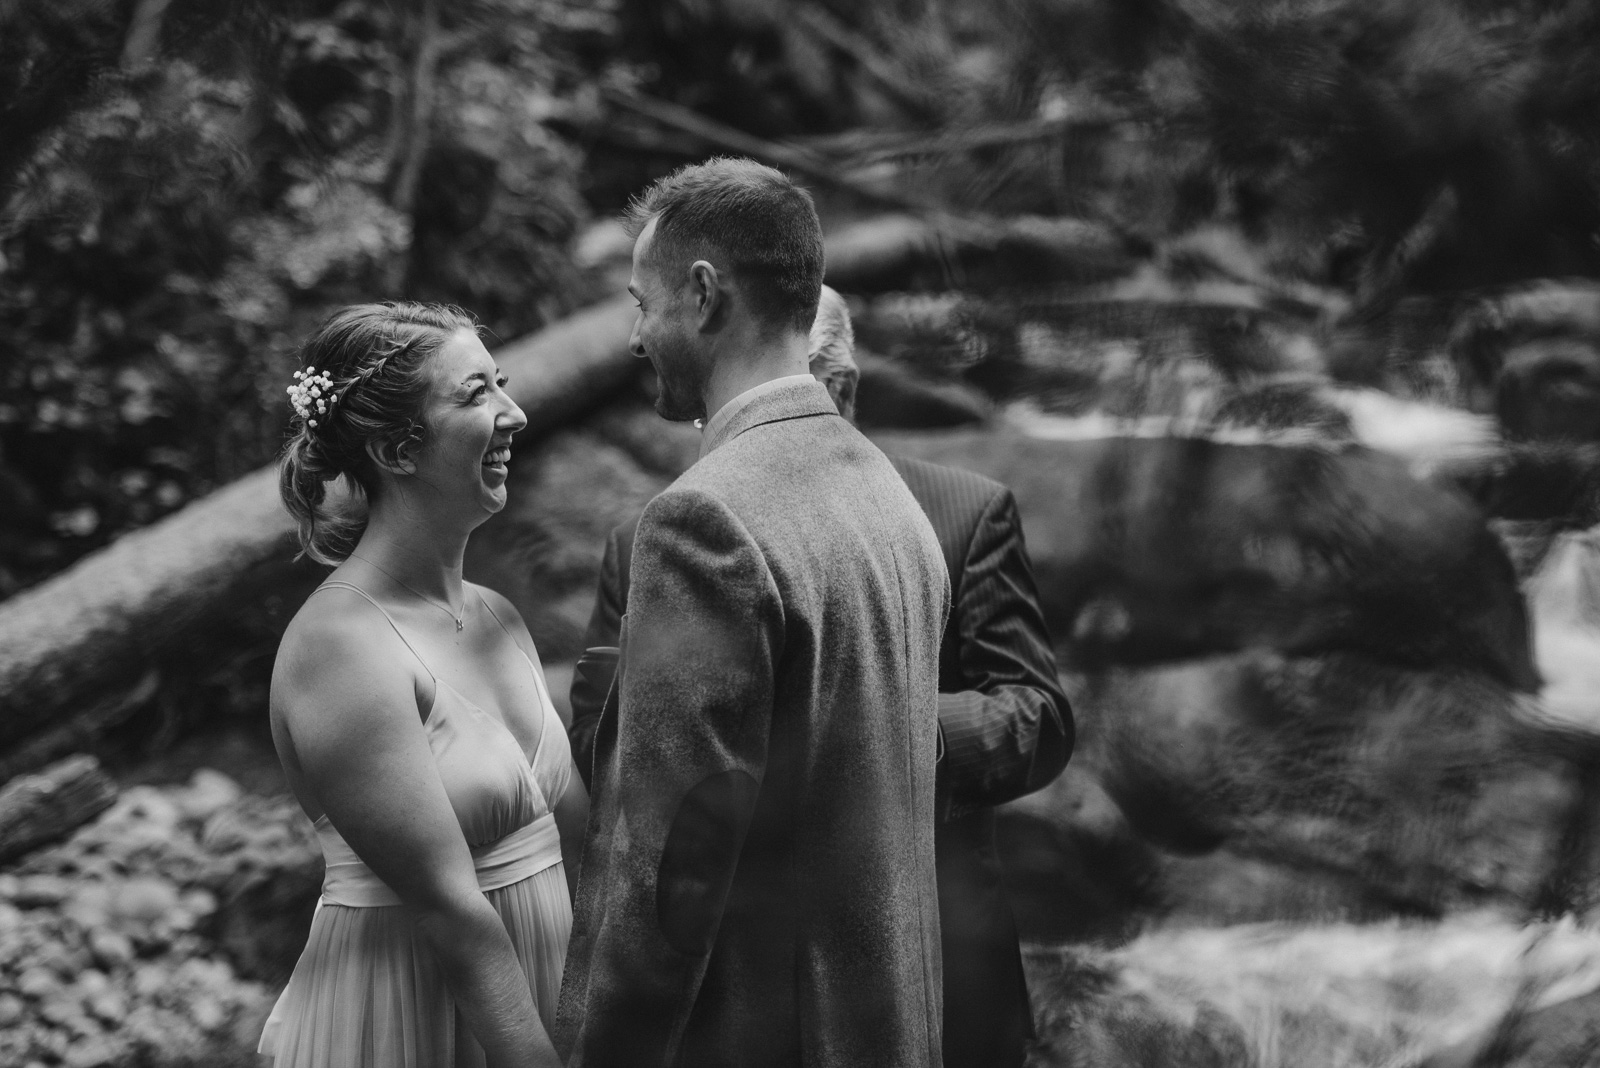 vancouver-island-wedding-photographers-cliff-gilker-park-smugglers-cove-elopement-9.jpg